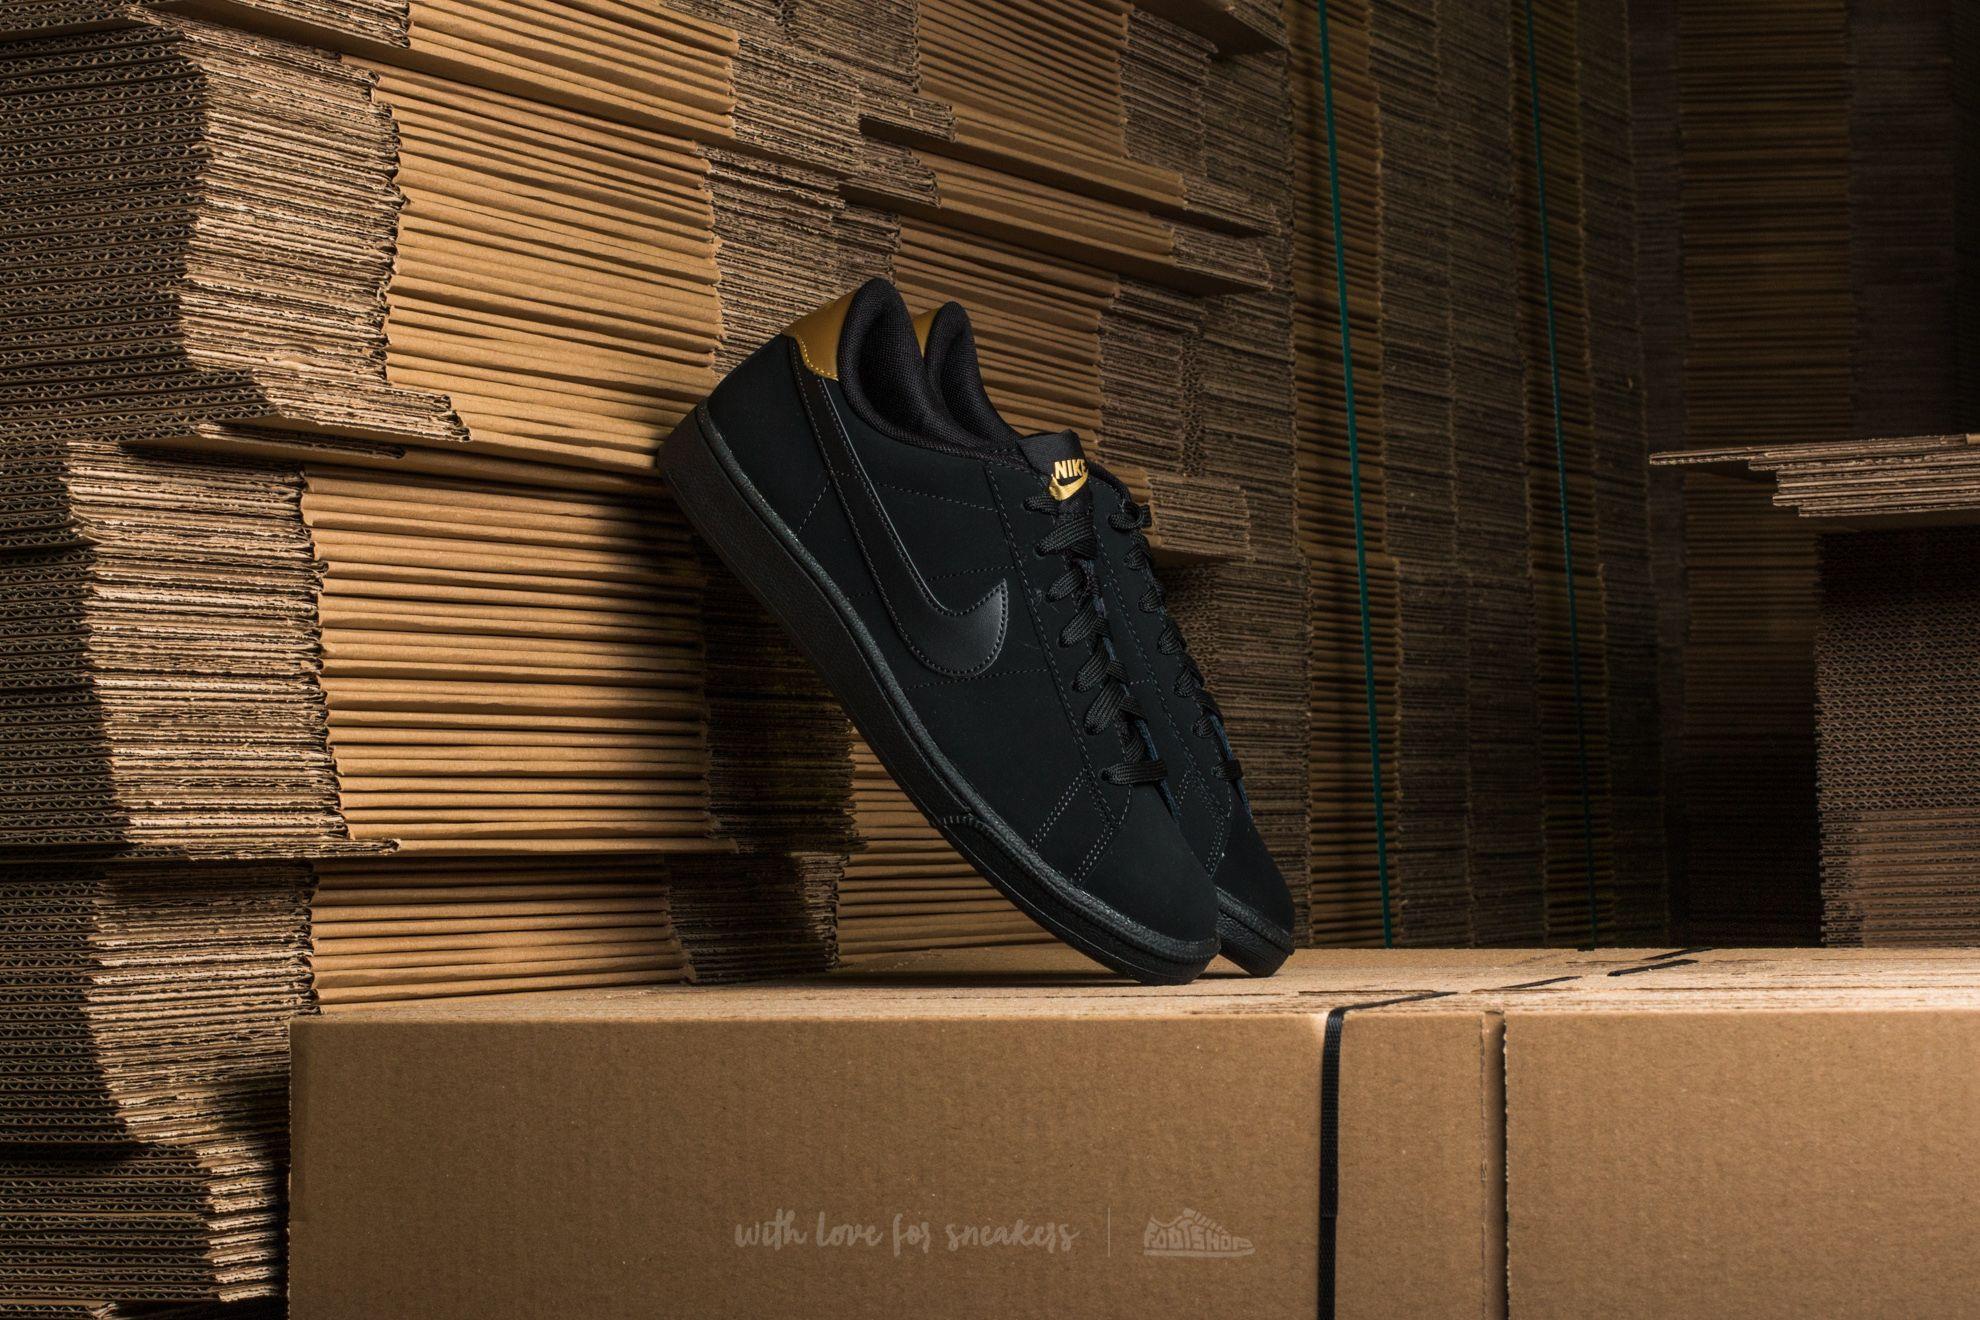 Nike Tennis Classic CS Black/ Black-Metallic Gold - 12167